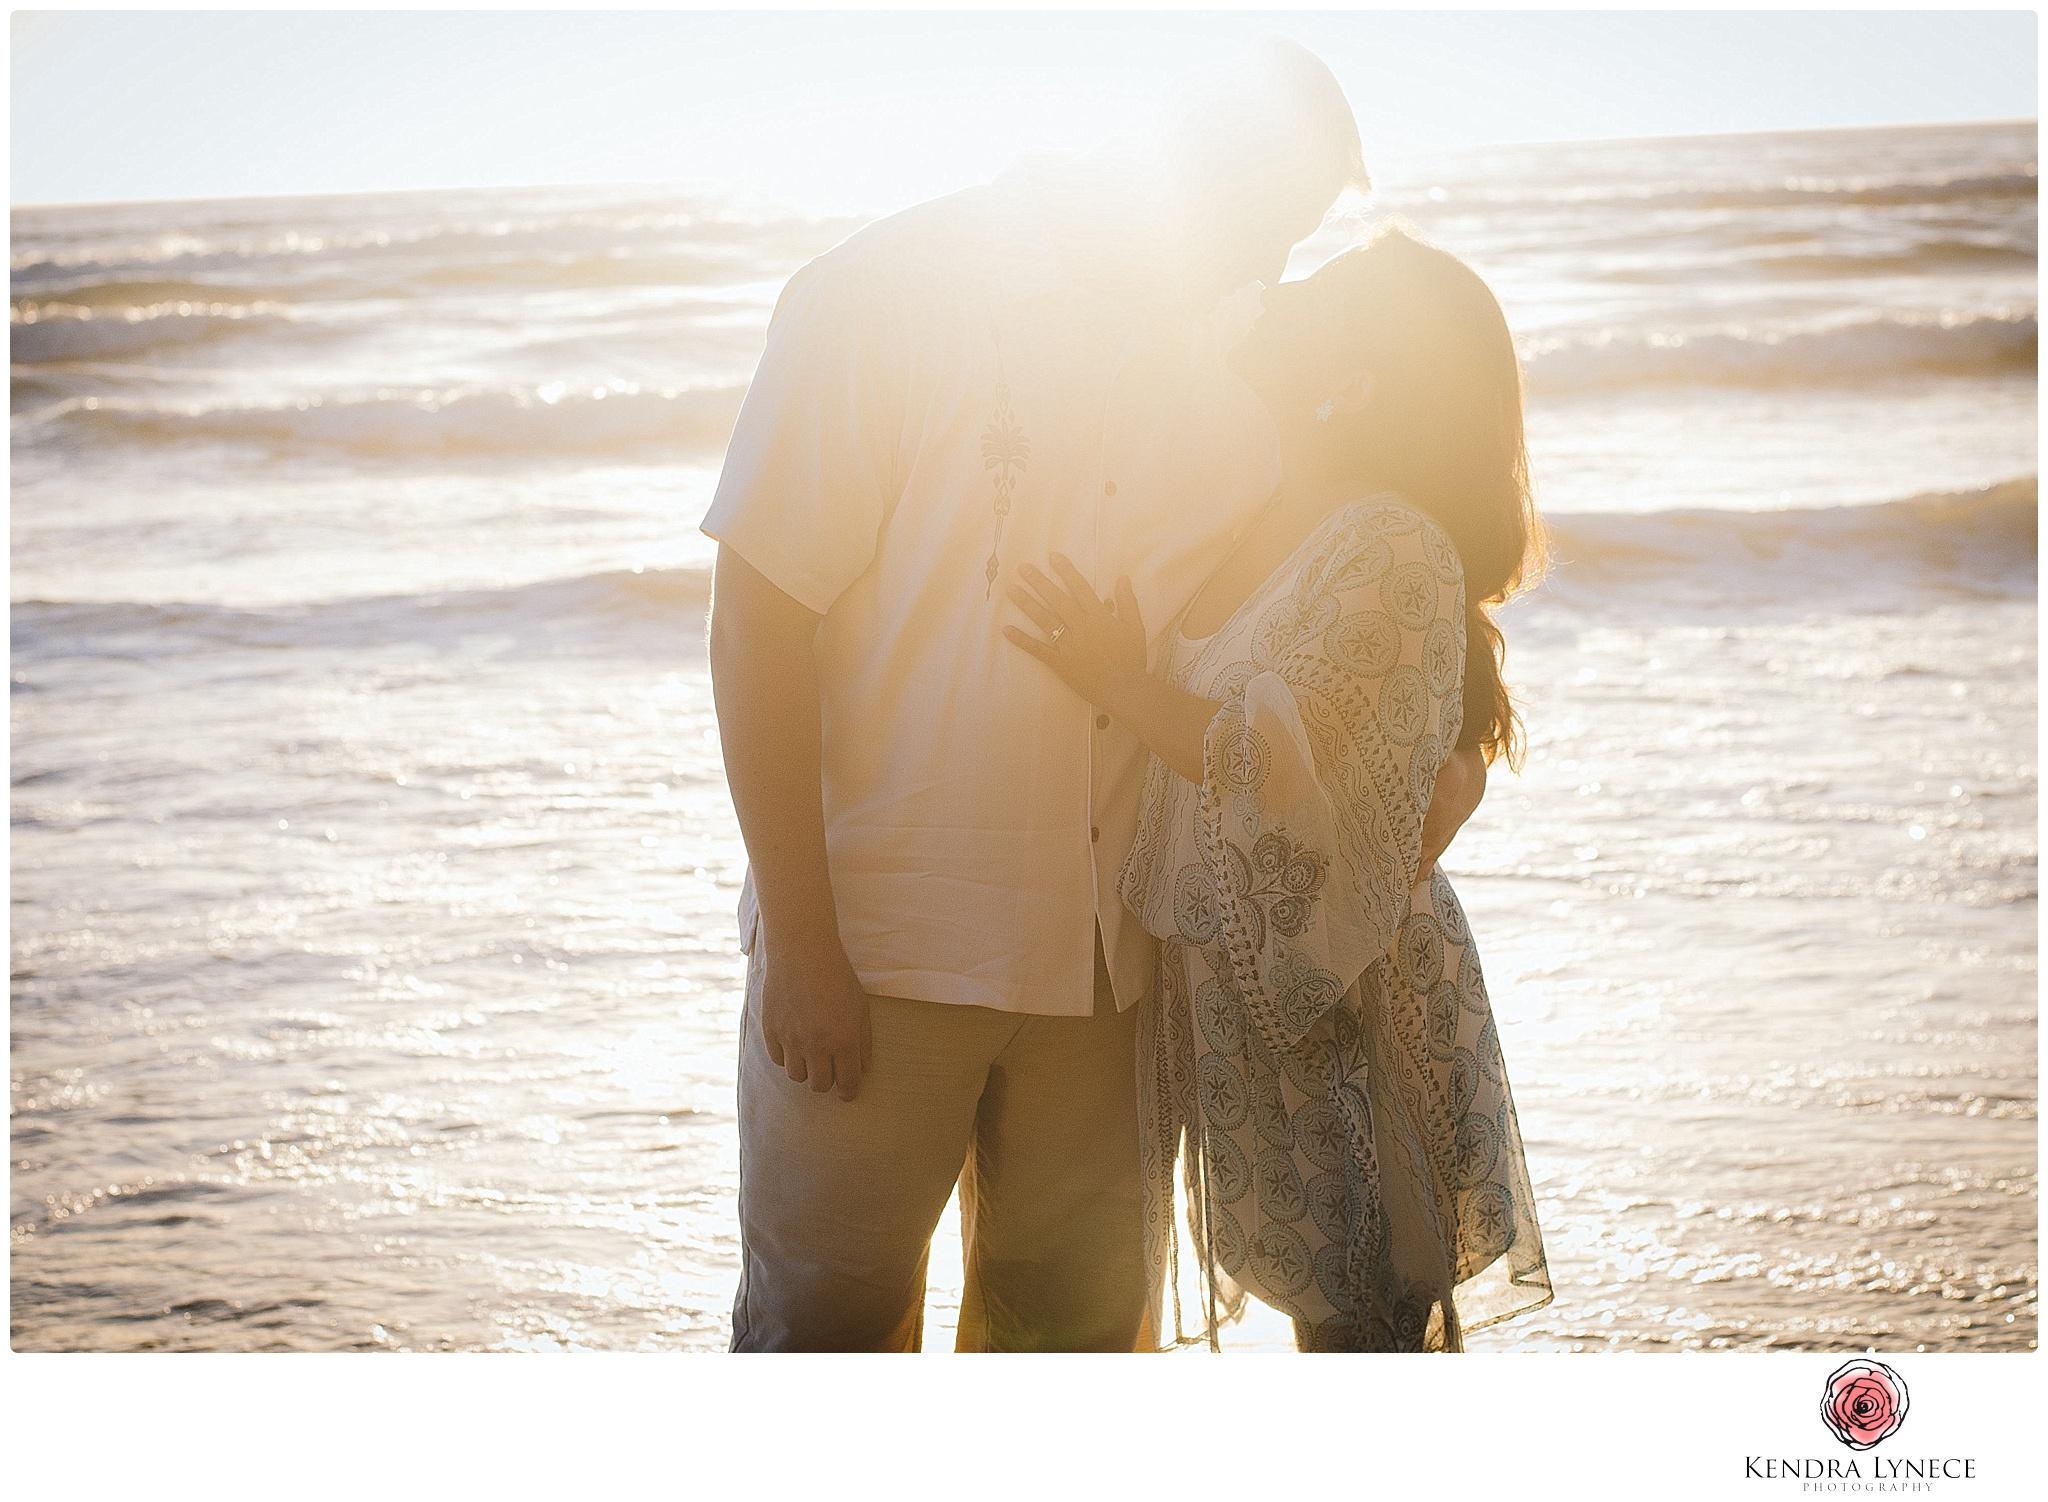 moonlight beach encinitas wedding honeymoon photos, san diego wedding honeymoon photos, sand diego california wedding photographer, photojournalistic wedding photography, beach engagement photos, beach wedding engagment photos at sunset